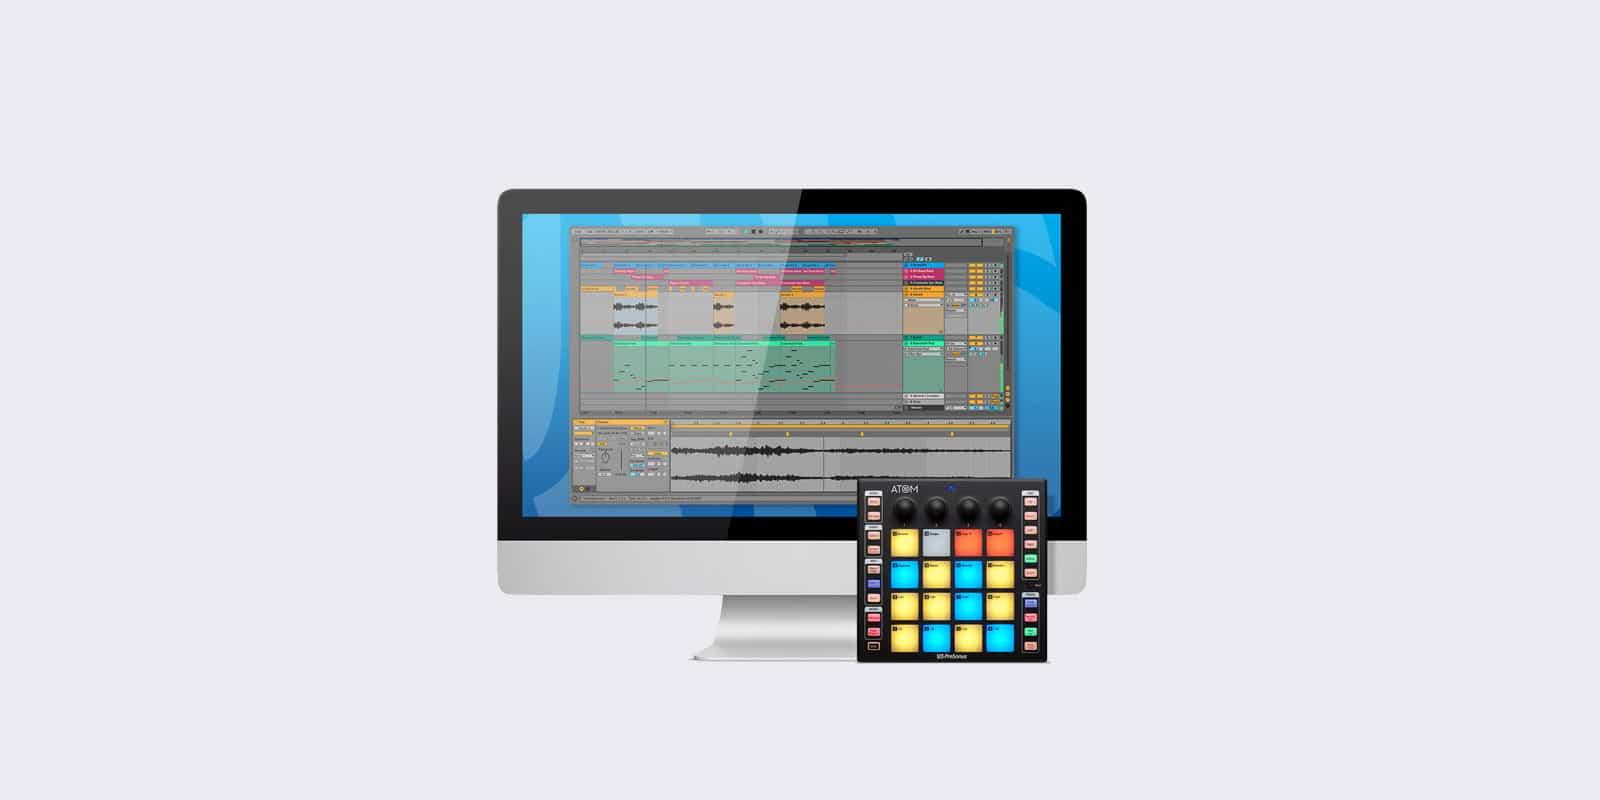 PreSonus ATOM and Ableton Live Form World-Class Performance Setup